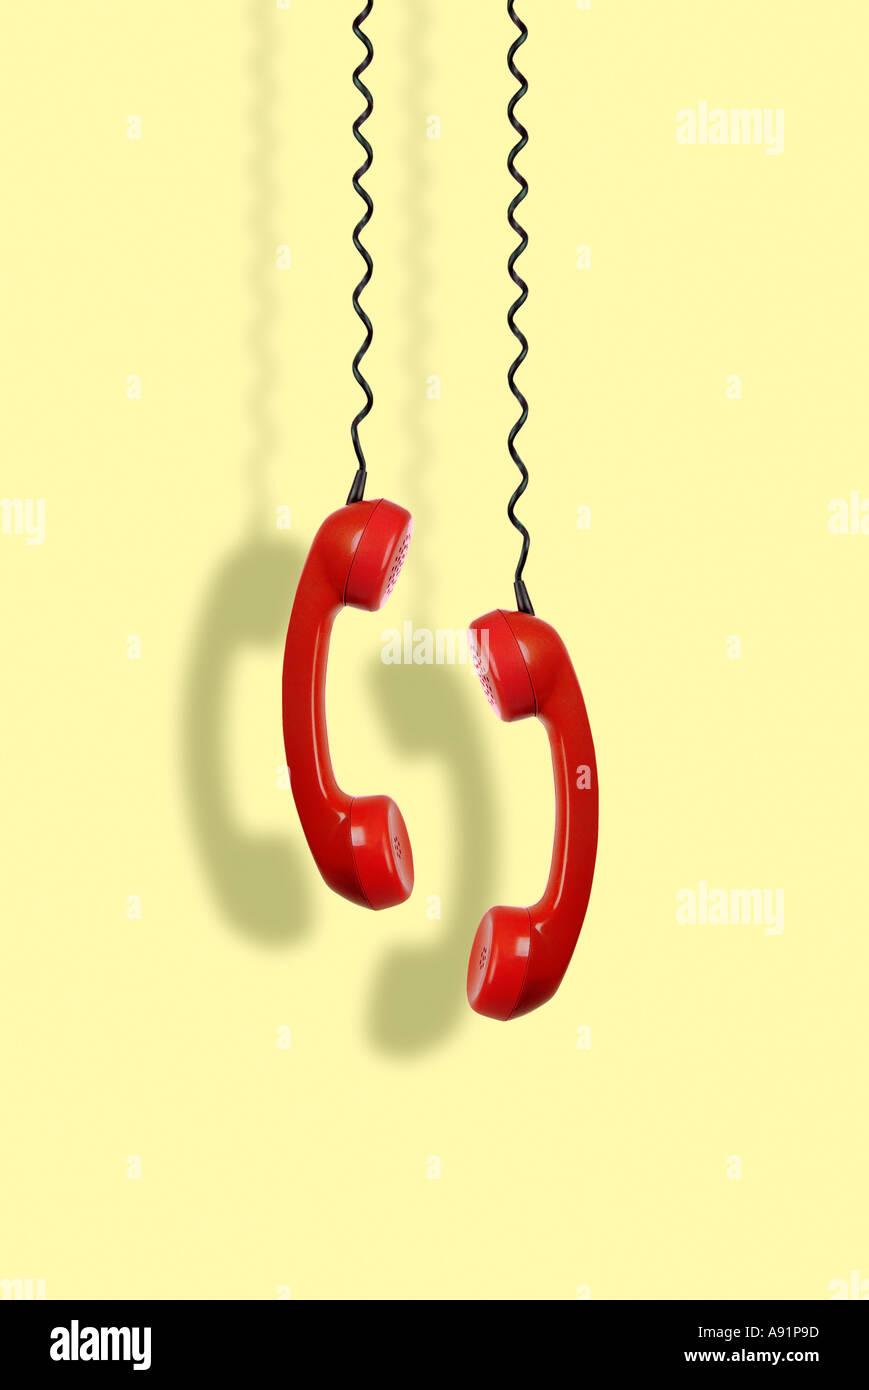 telephones Telefone - Stock Image